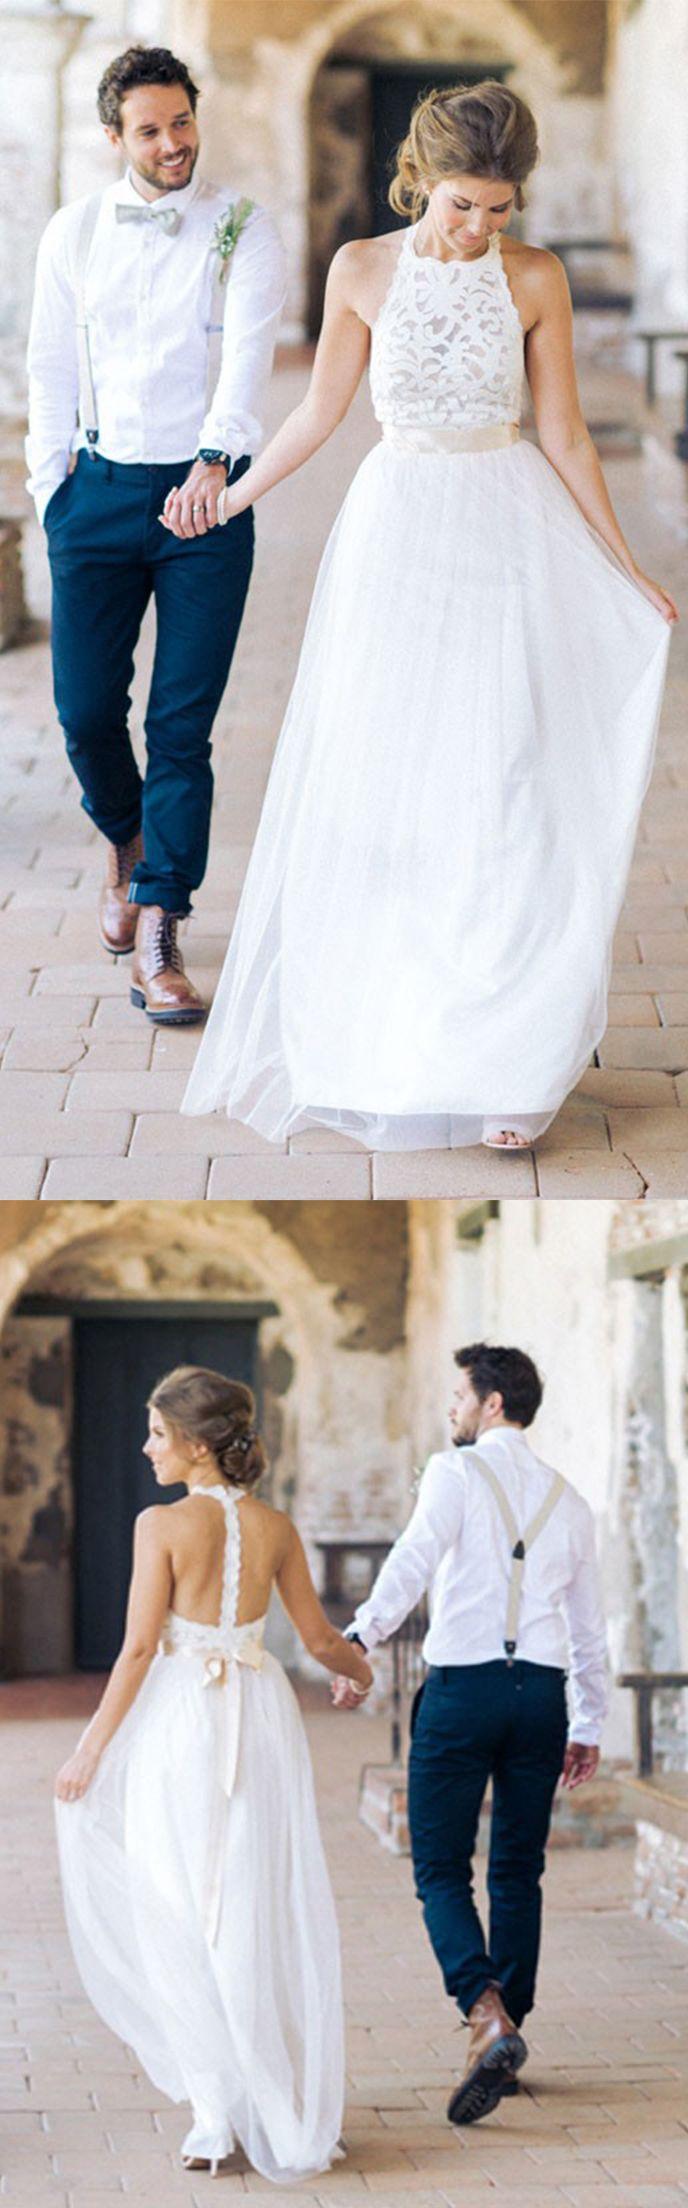 Simple jewel wedding dresses sleeveless long wedding dress lace